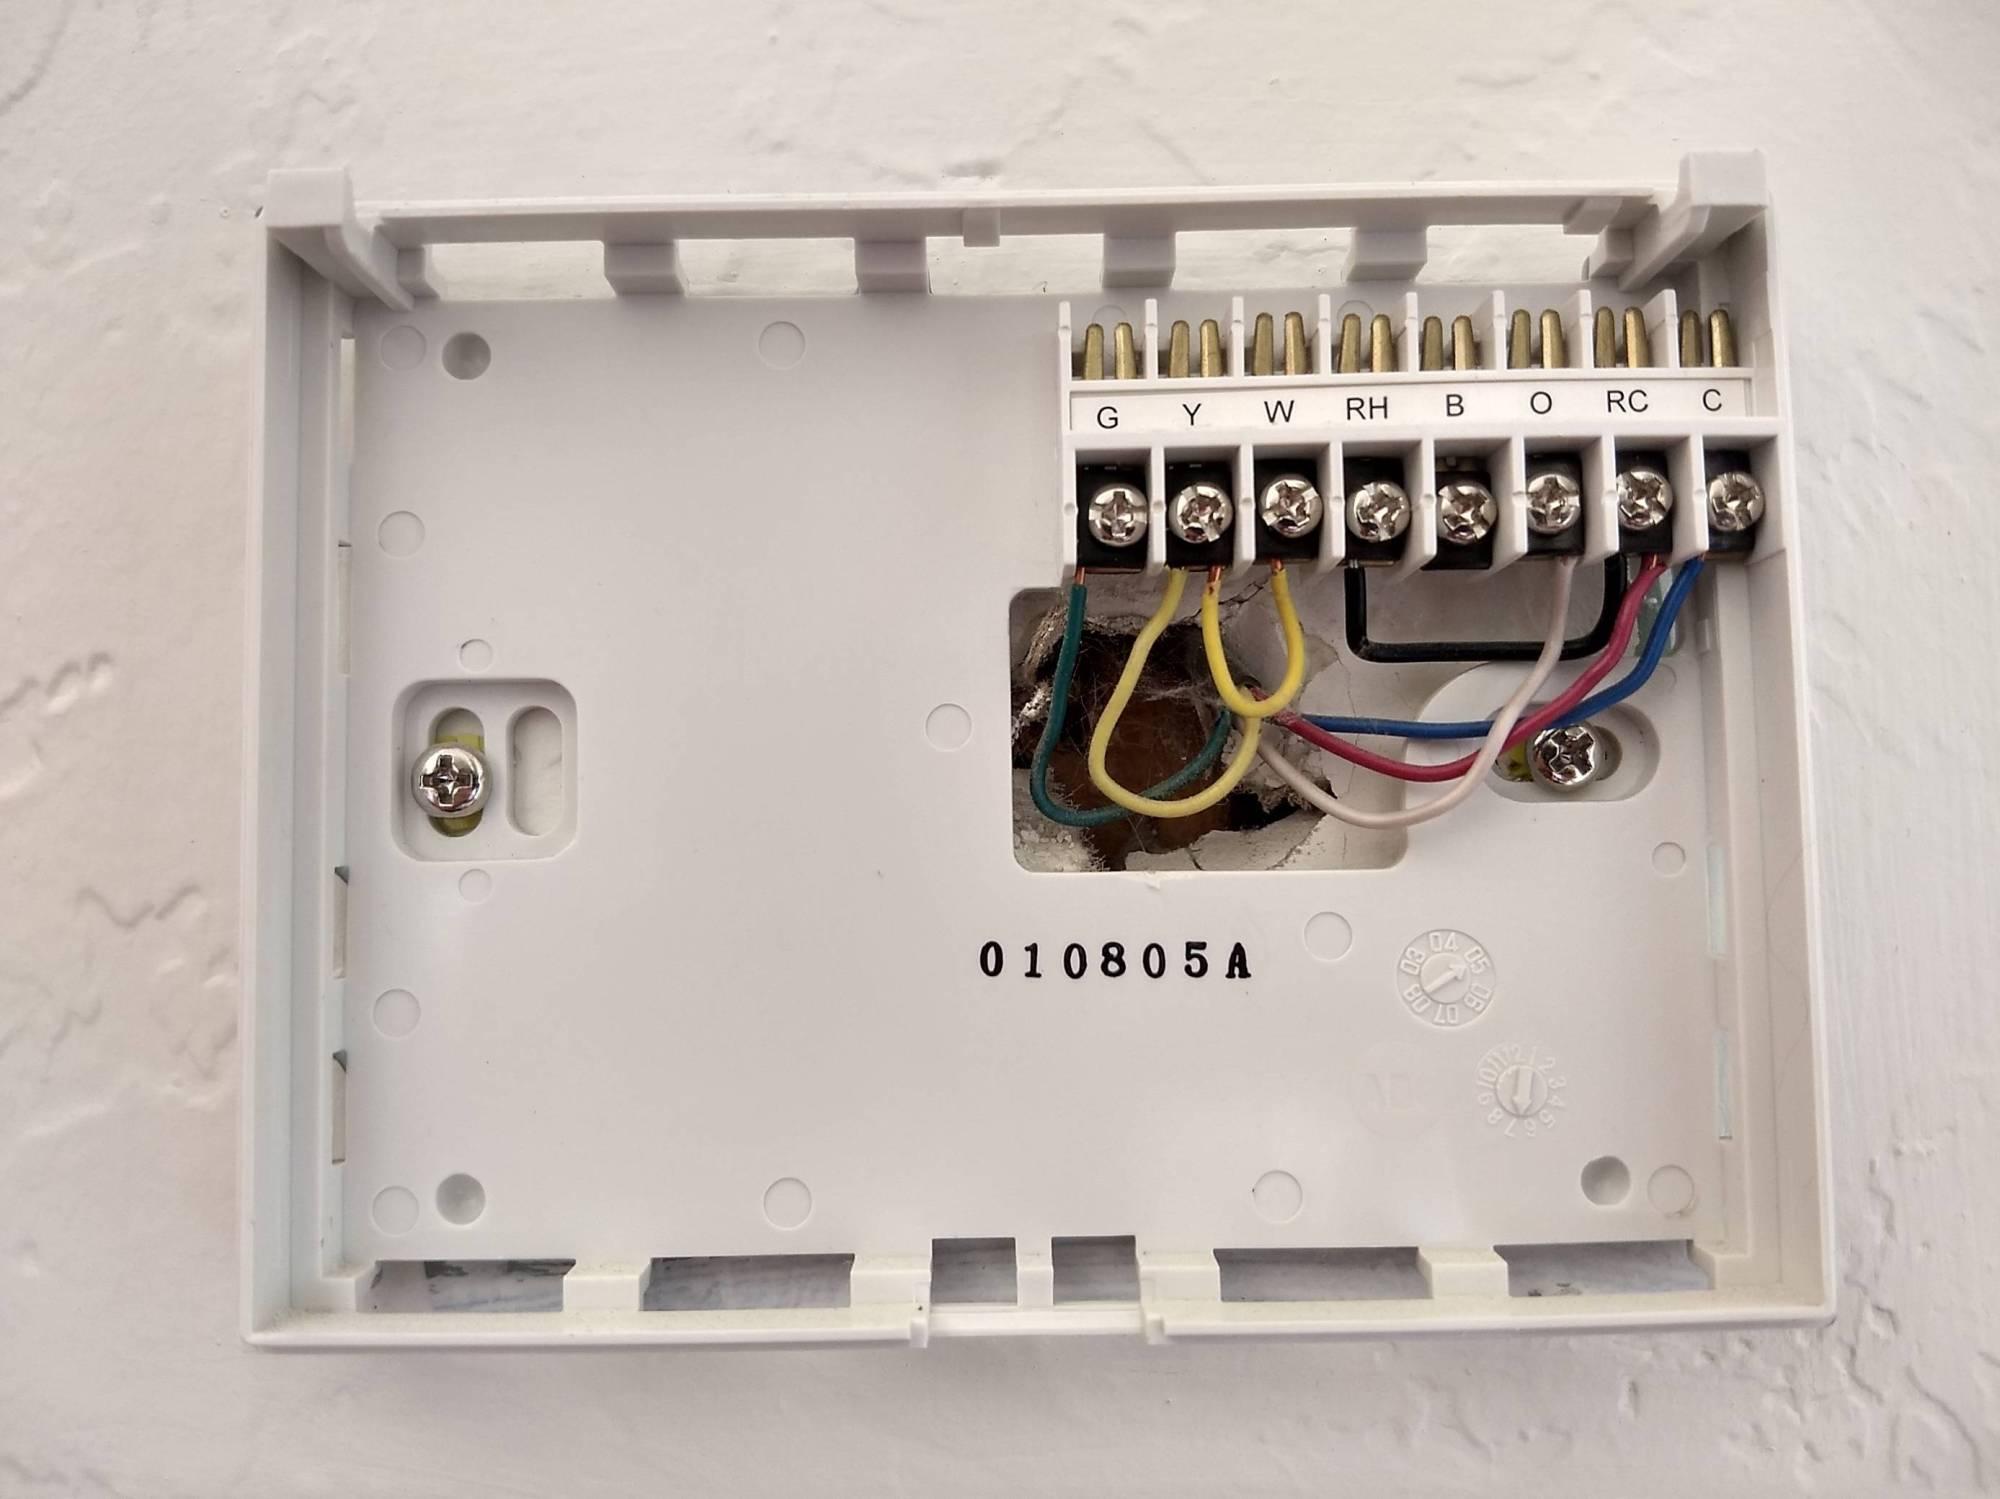 hight resolution of wiring air handler doityourselfcom community forums wiring diagram honeywell rth2300 wiring doityourselfcom community forums